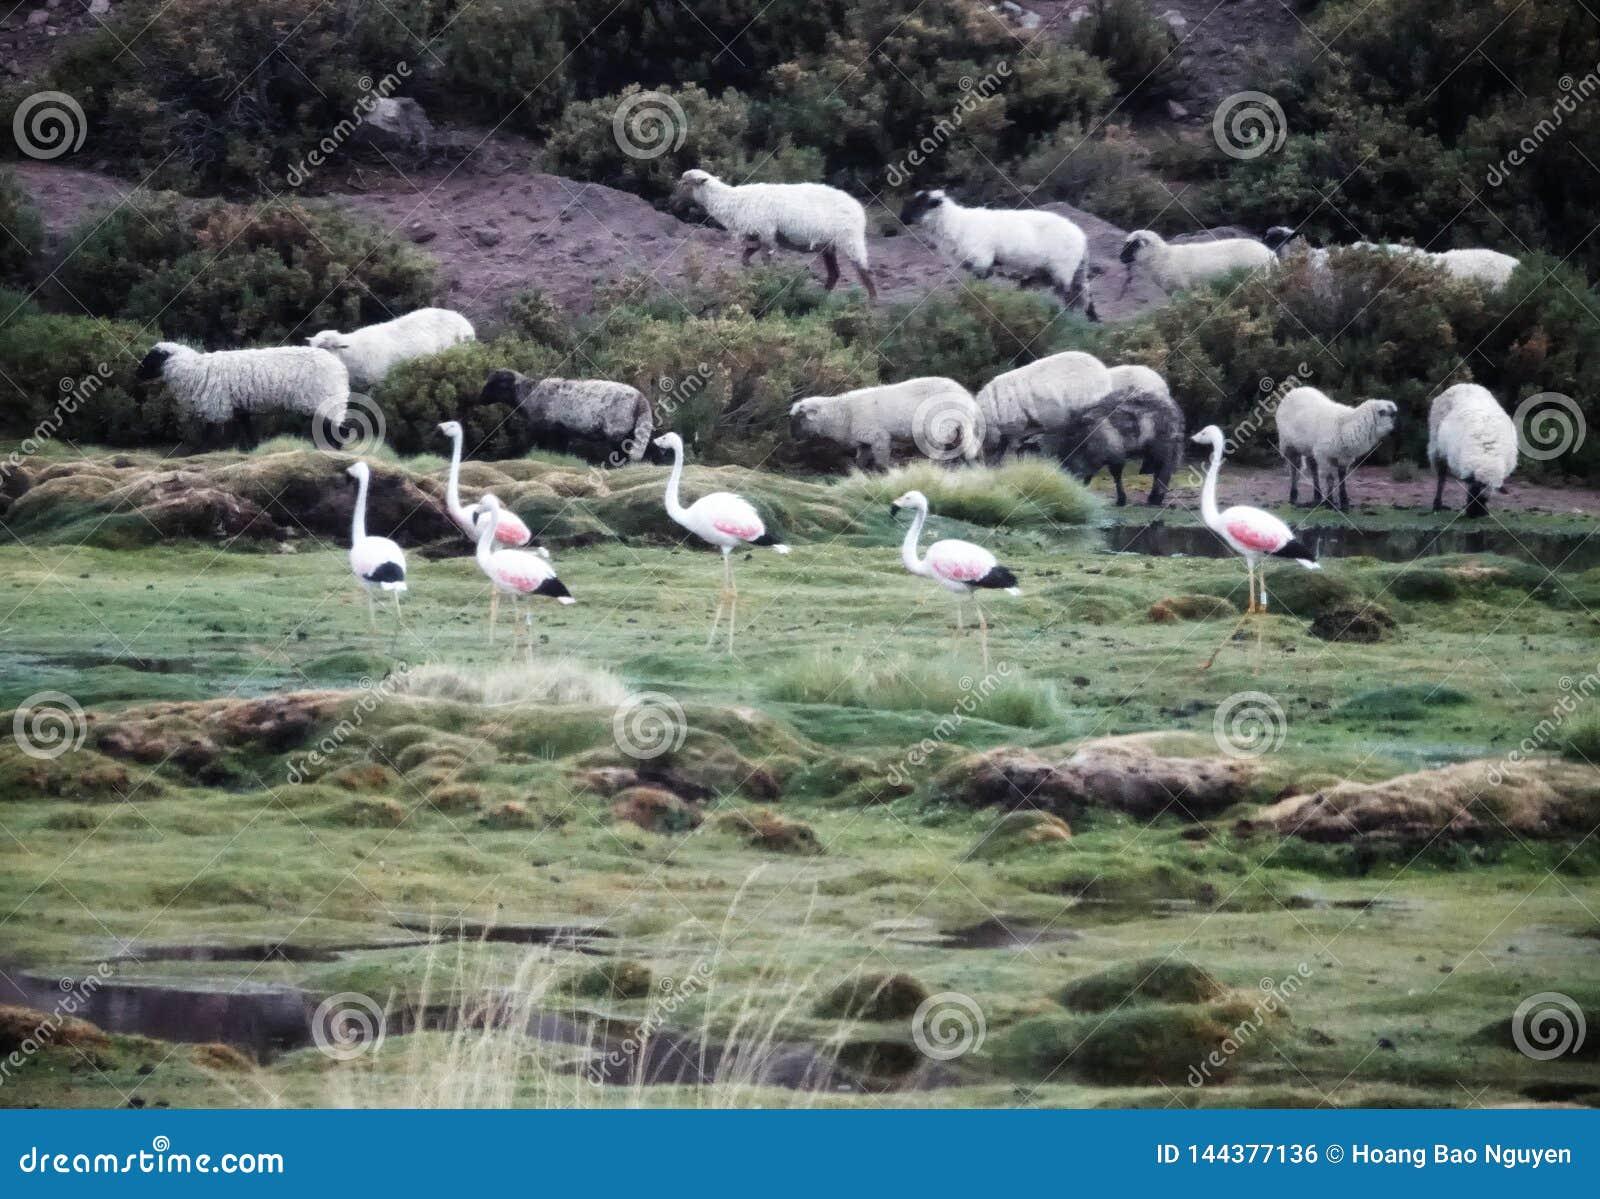 Flamingo season in Uyuni, Bolivia